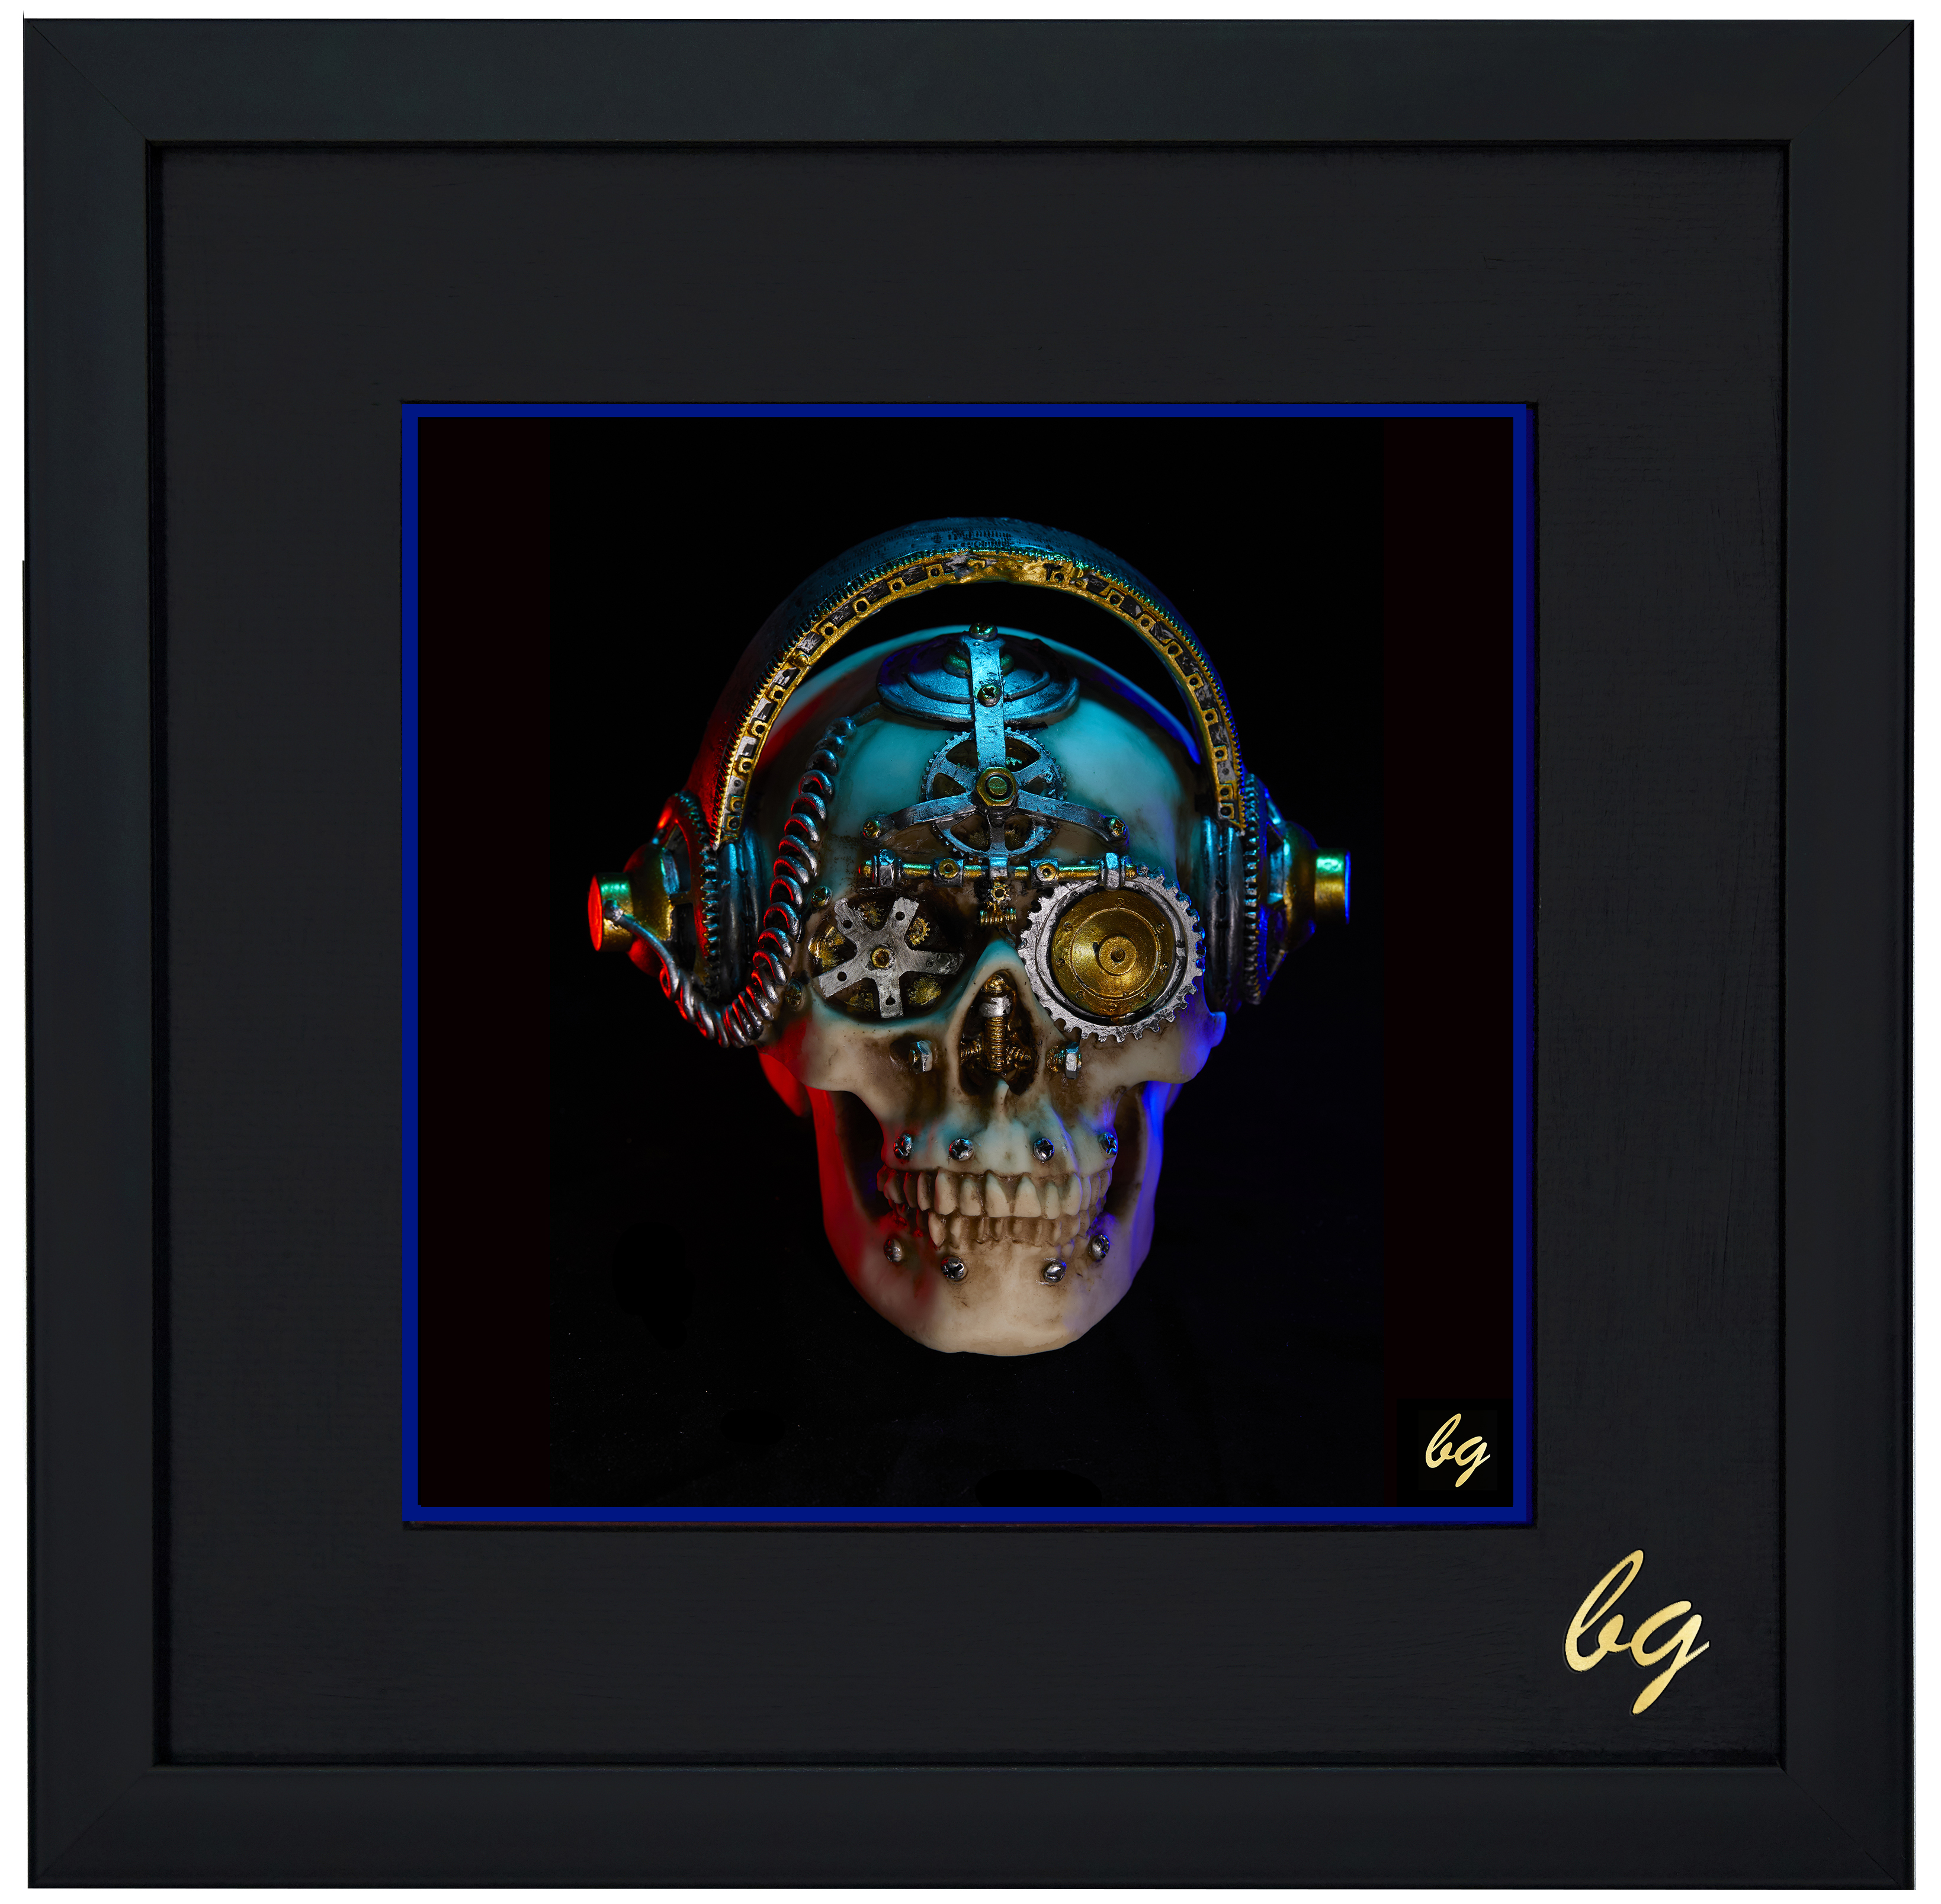 NeonMusicFrame